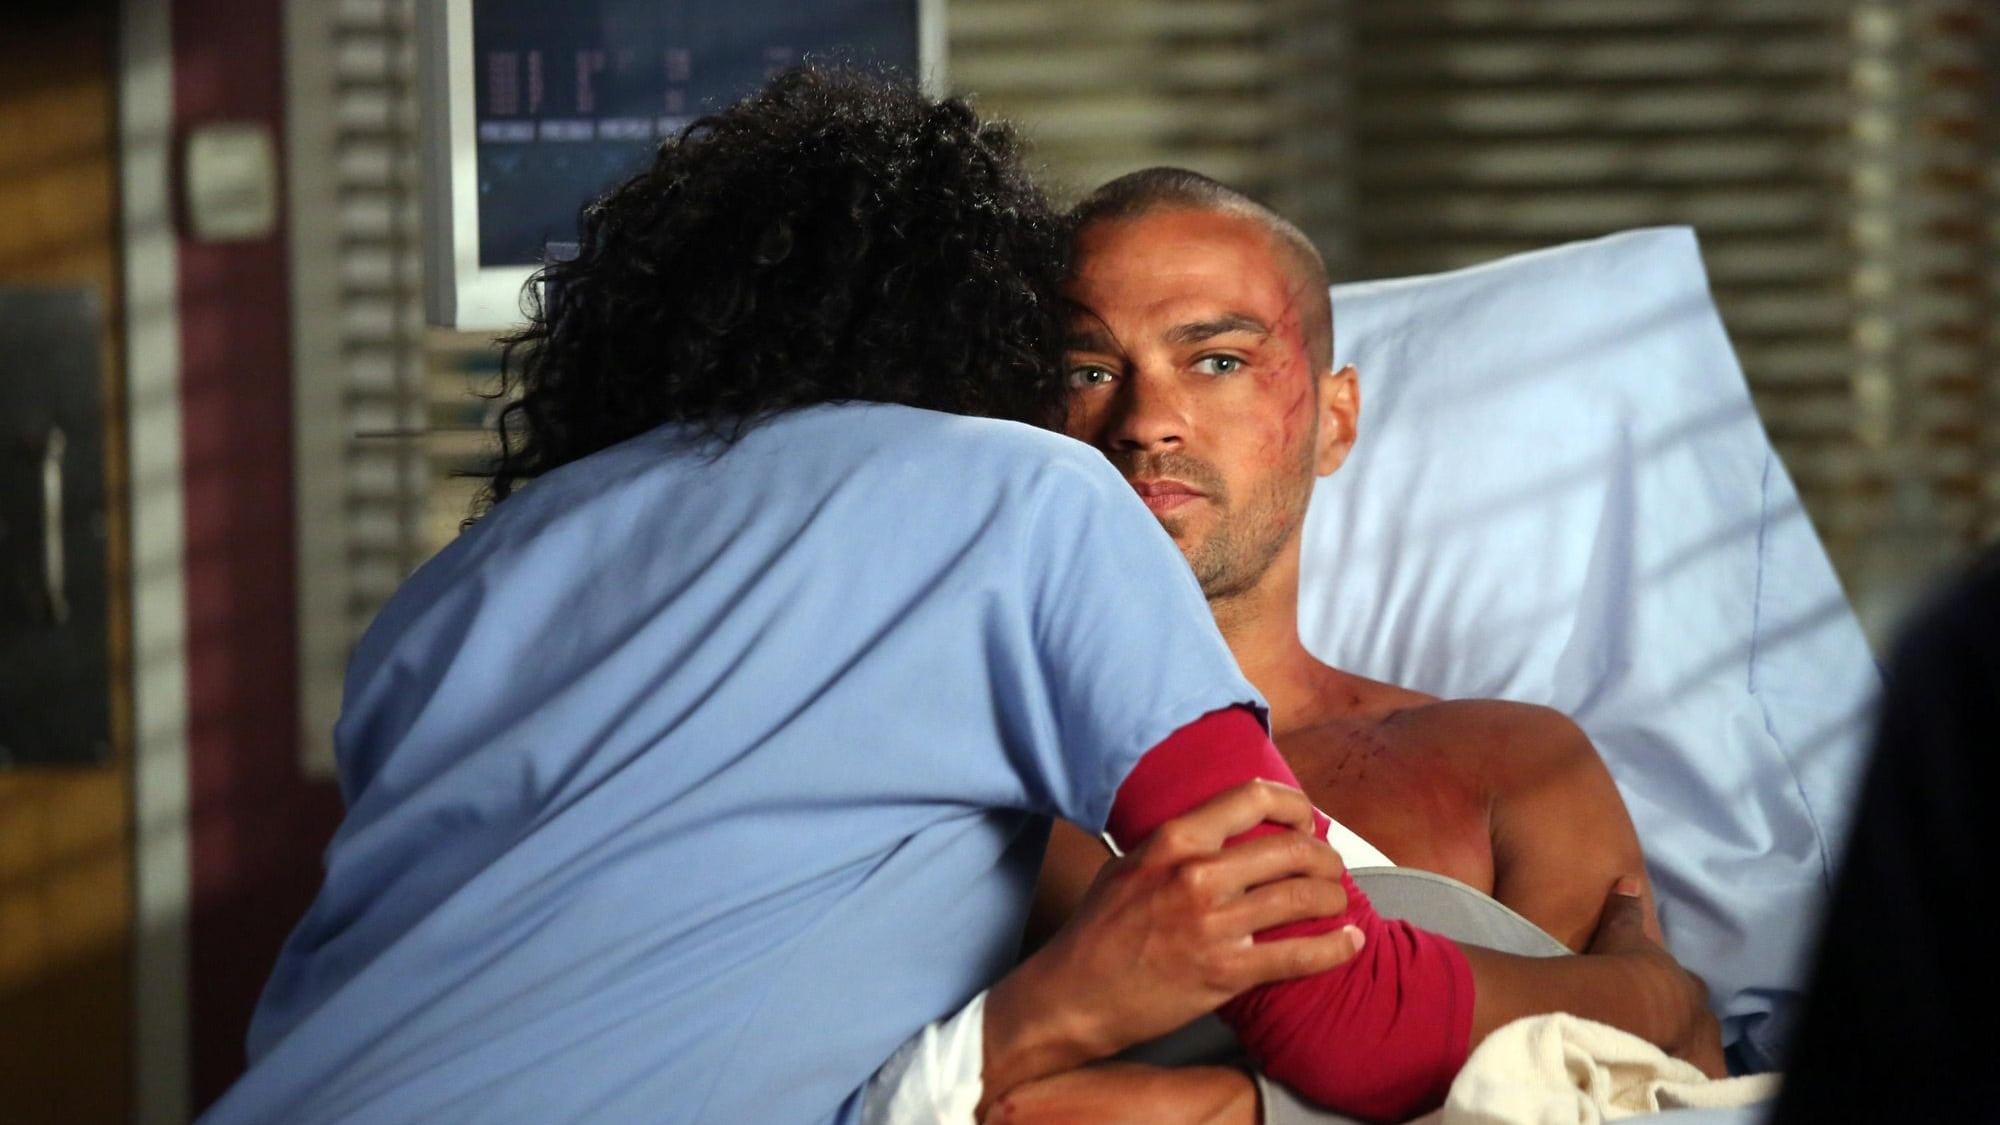 Greys Anatomy Season 10 Episode 1 Putlocker